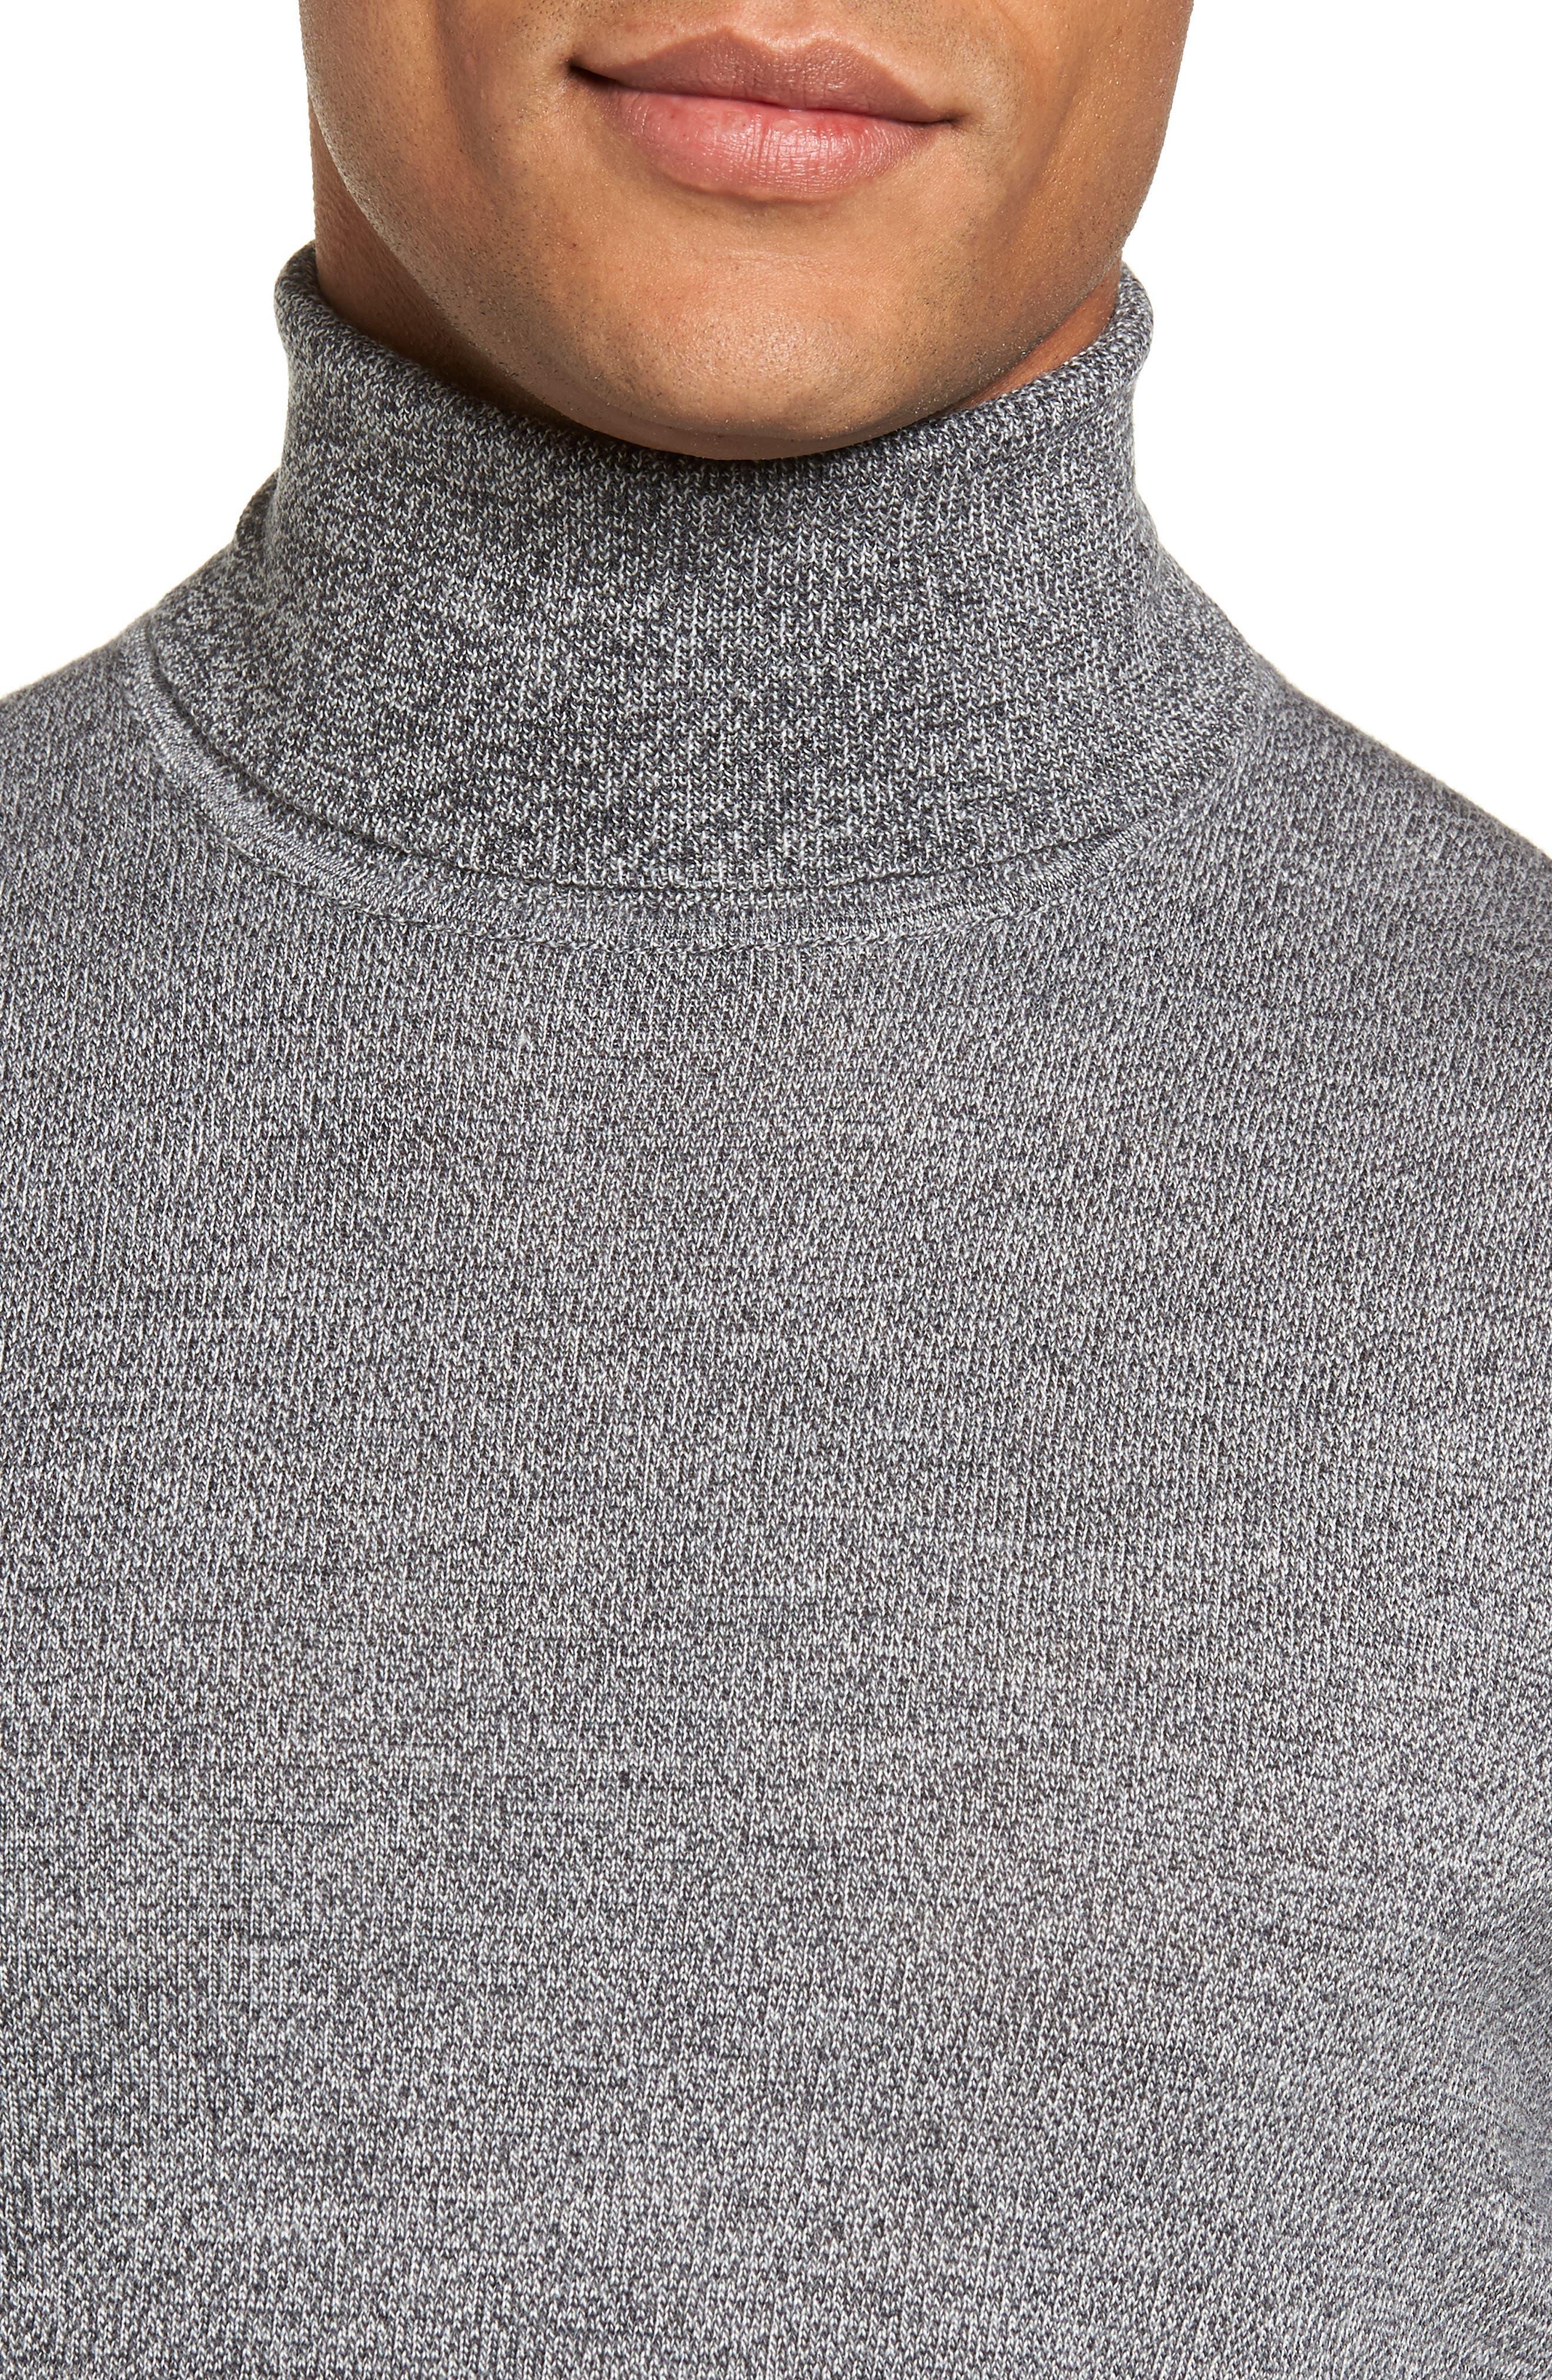 Merino Wool Turtleneck Sweater,                             Alternate thumbnail 4, color,                             Grey Shade Marl